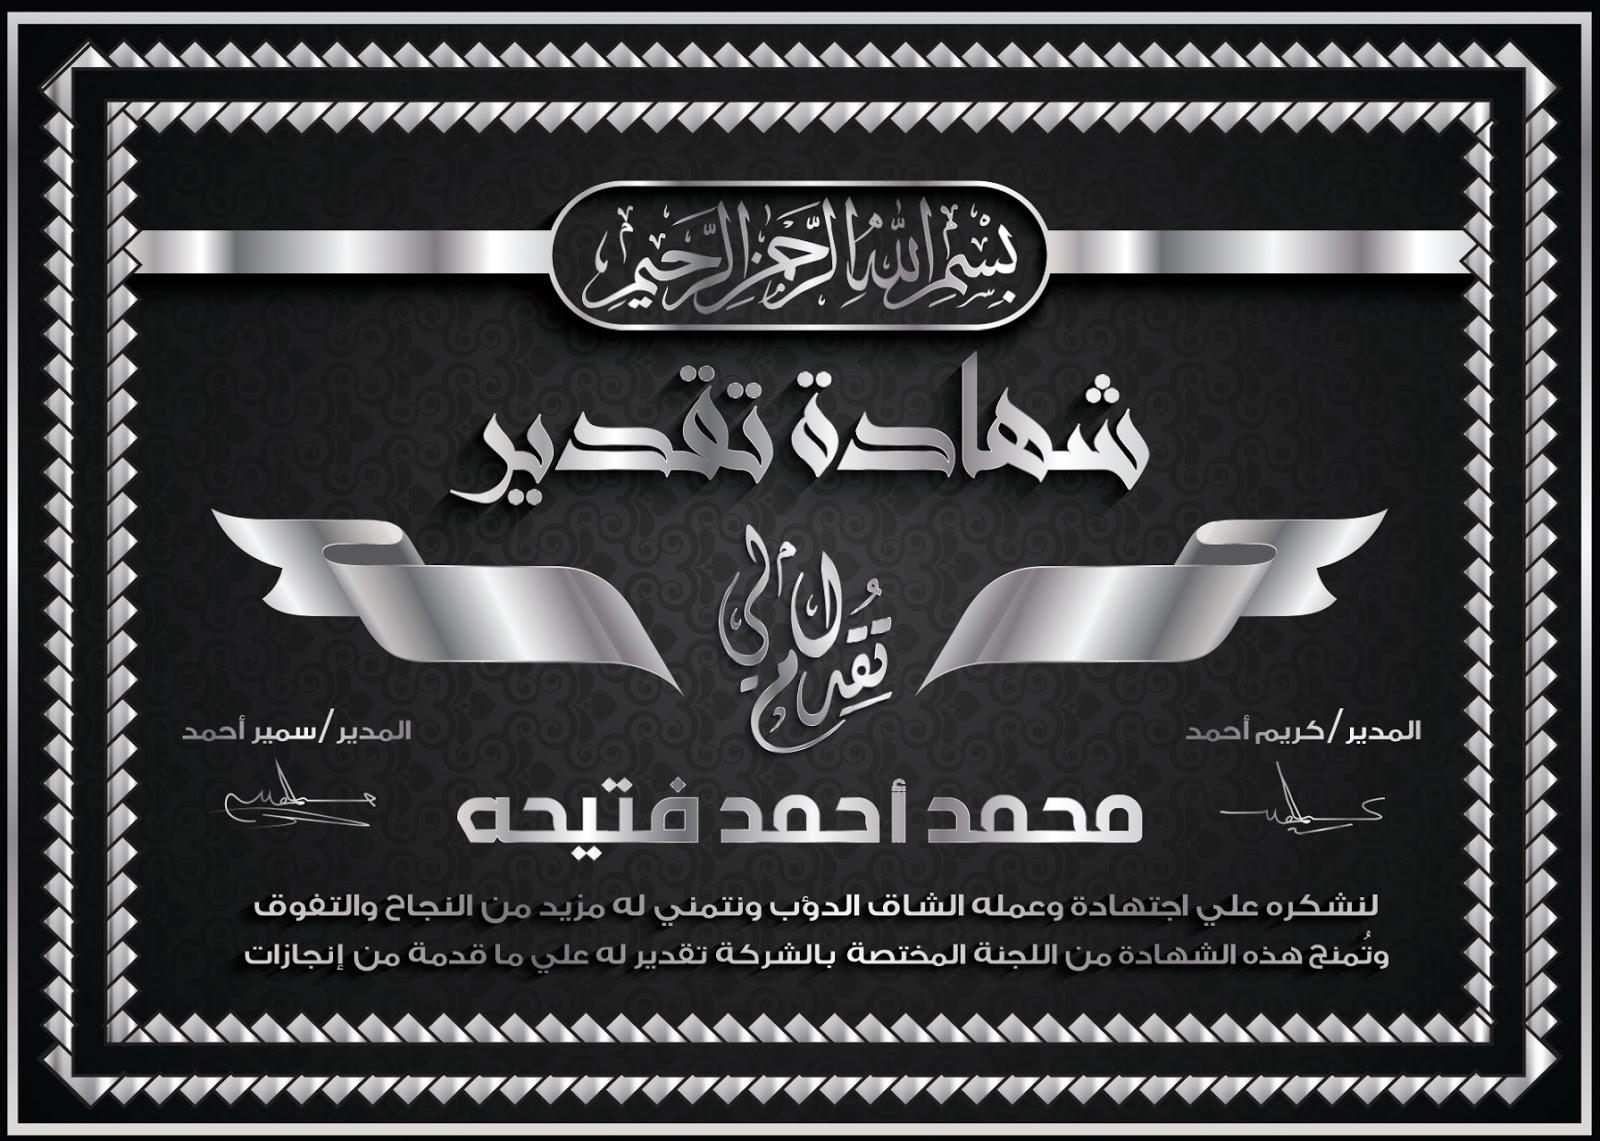 A black open source certificate of appreciation psd decorated in beautiful silver